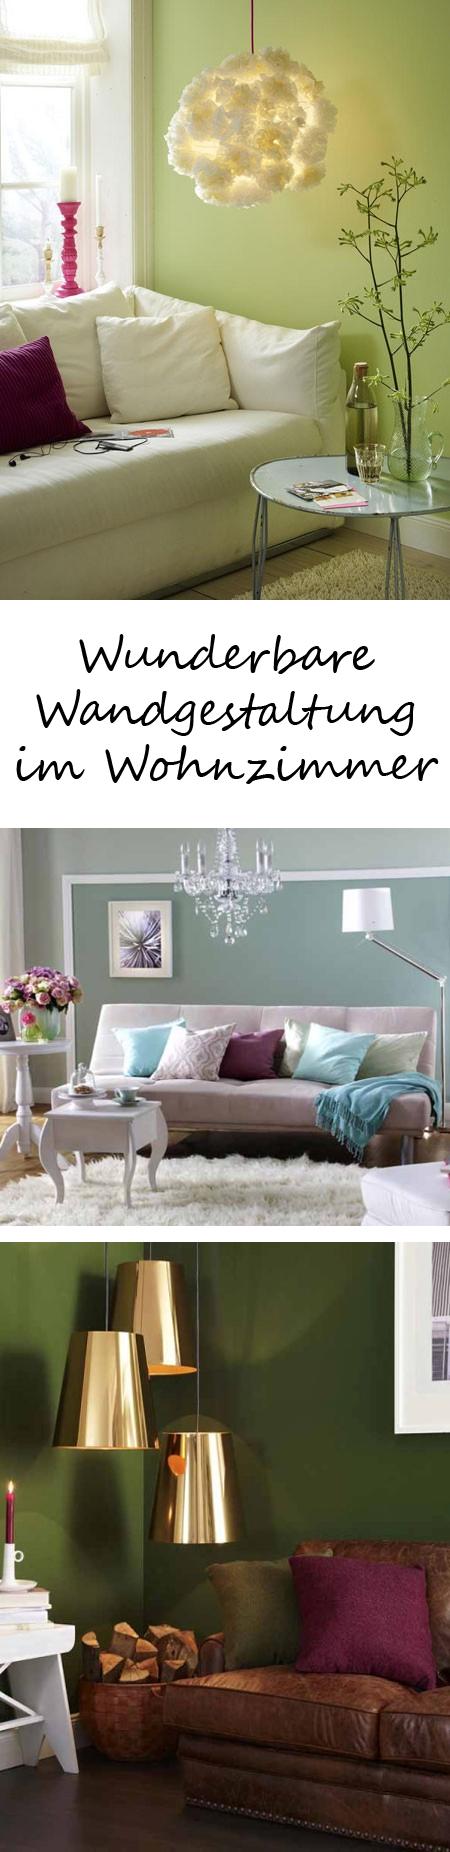 Wunderbare Wandgestaltung im Wohnzimmer | Beautiful space, Living ...